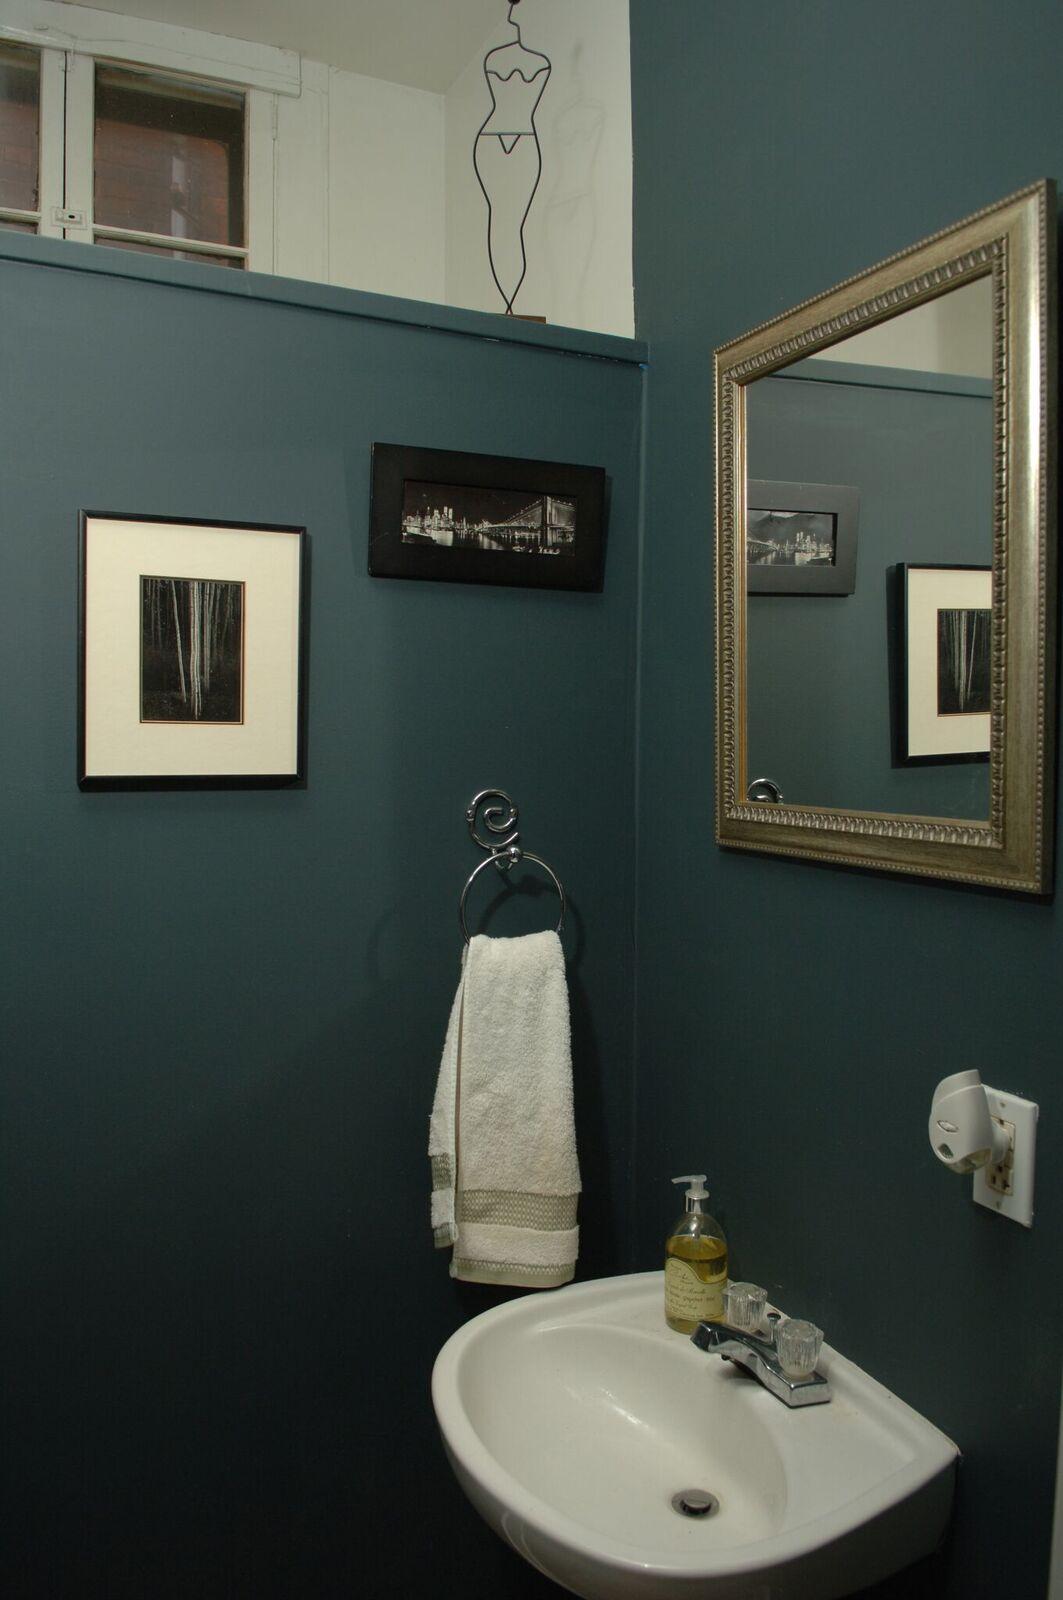 222 first floor bathroom_preview.jpeg